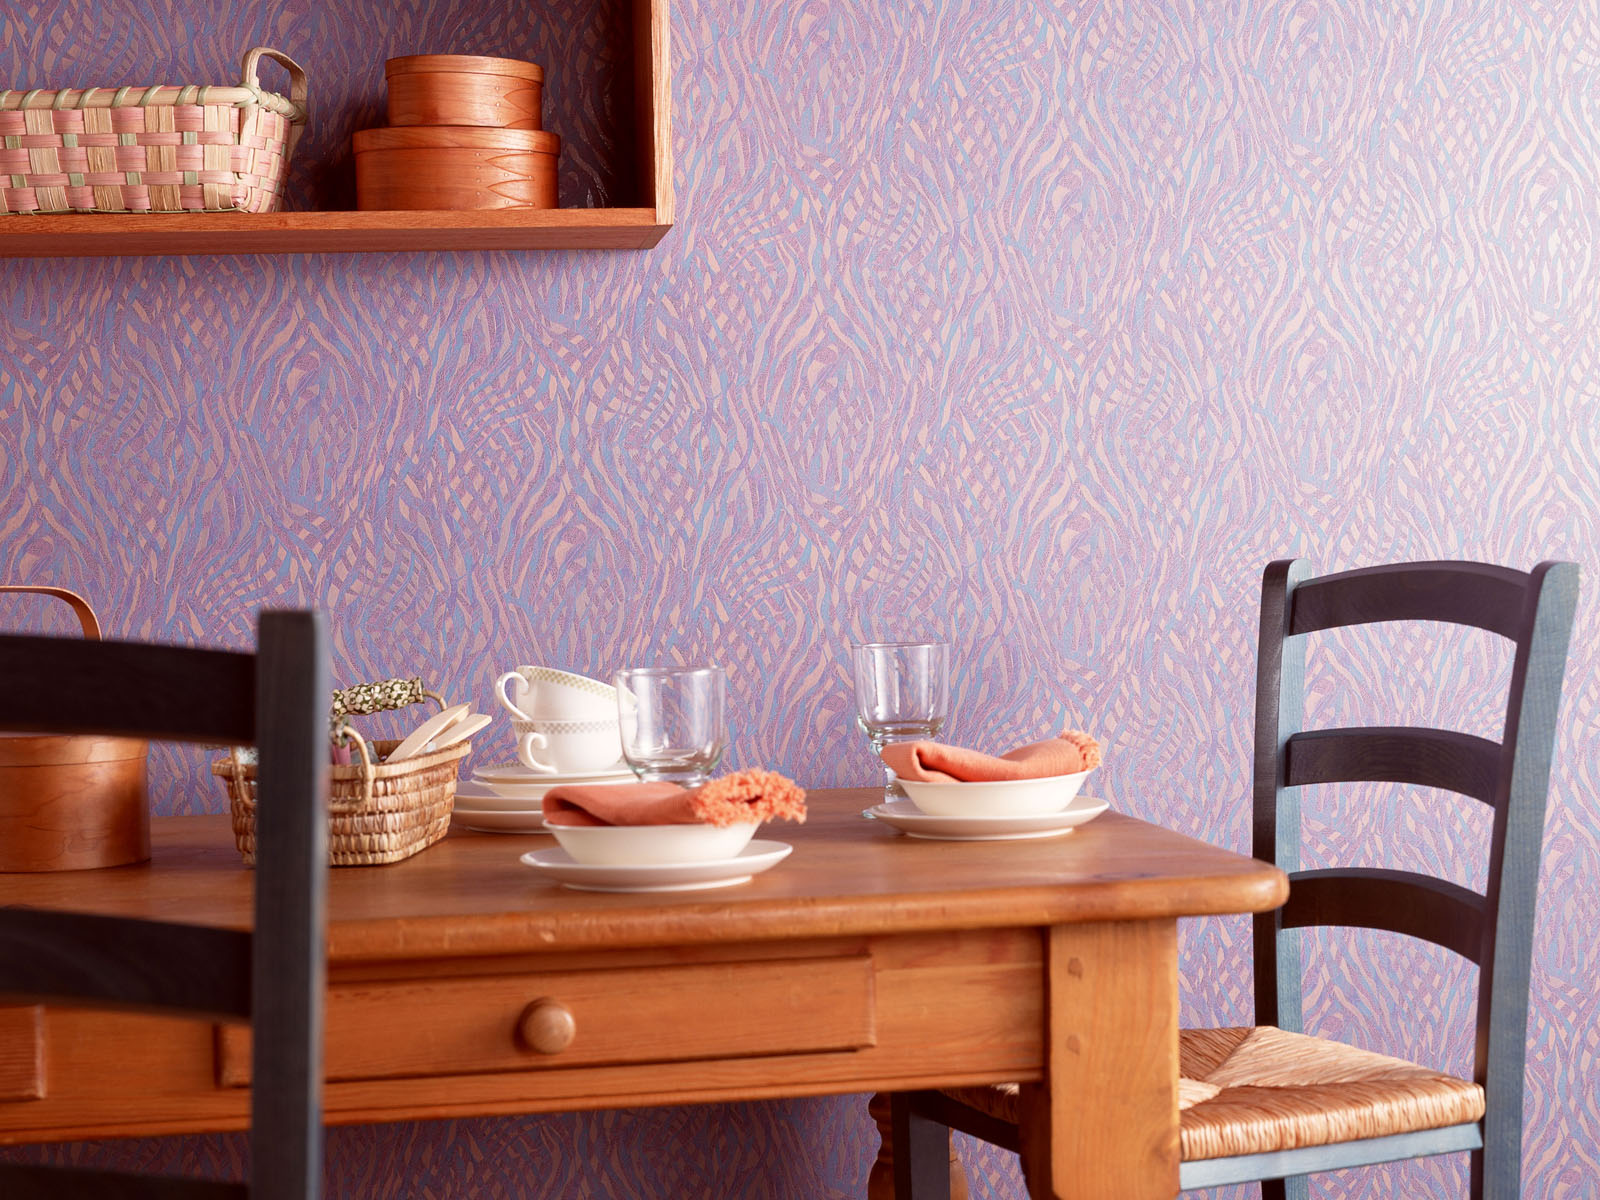 breakfast-table-in-a-kitchen Simple breakfast table in a kitchen